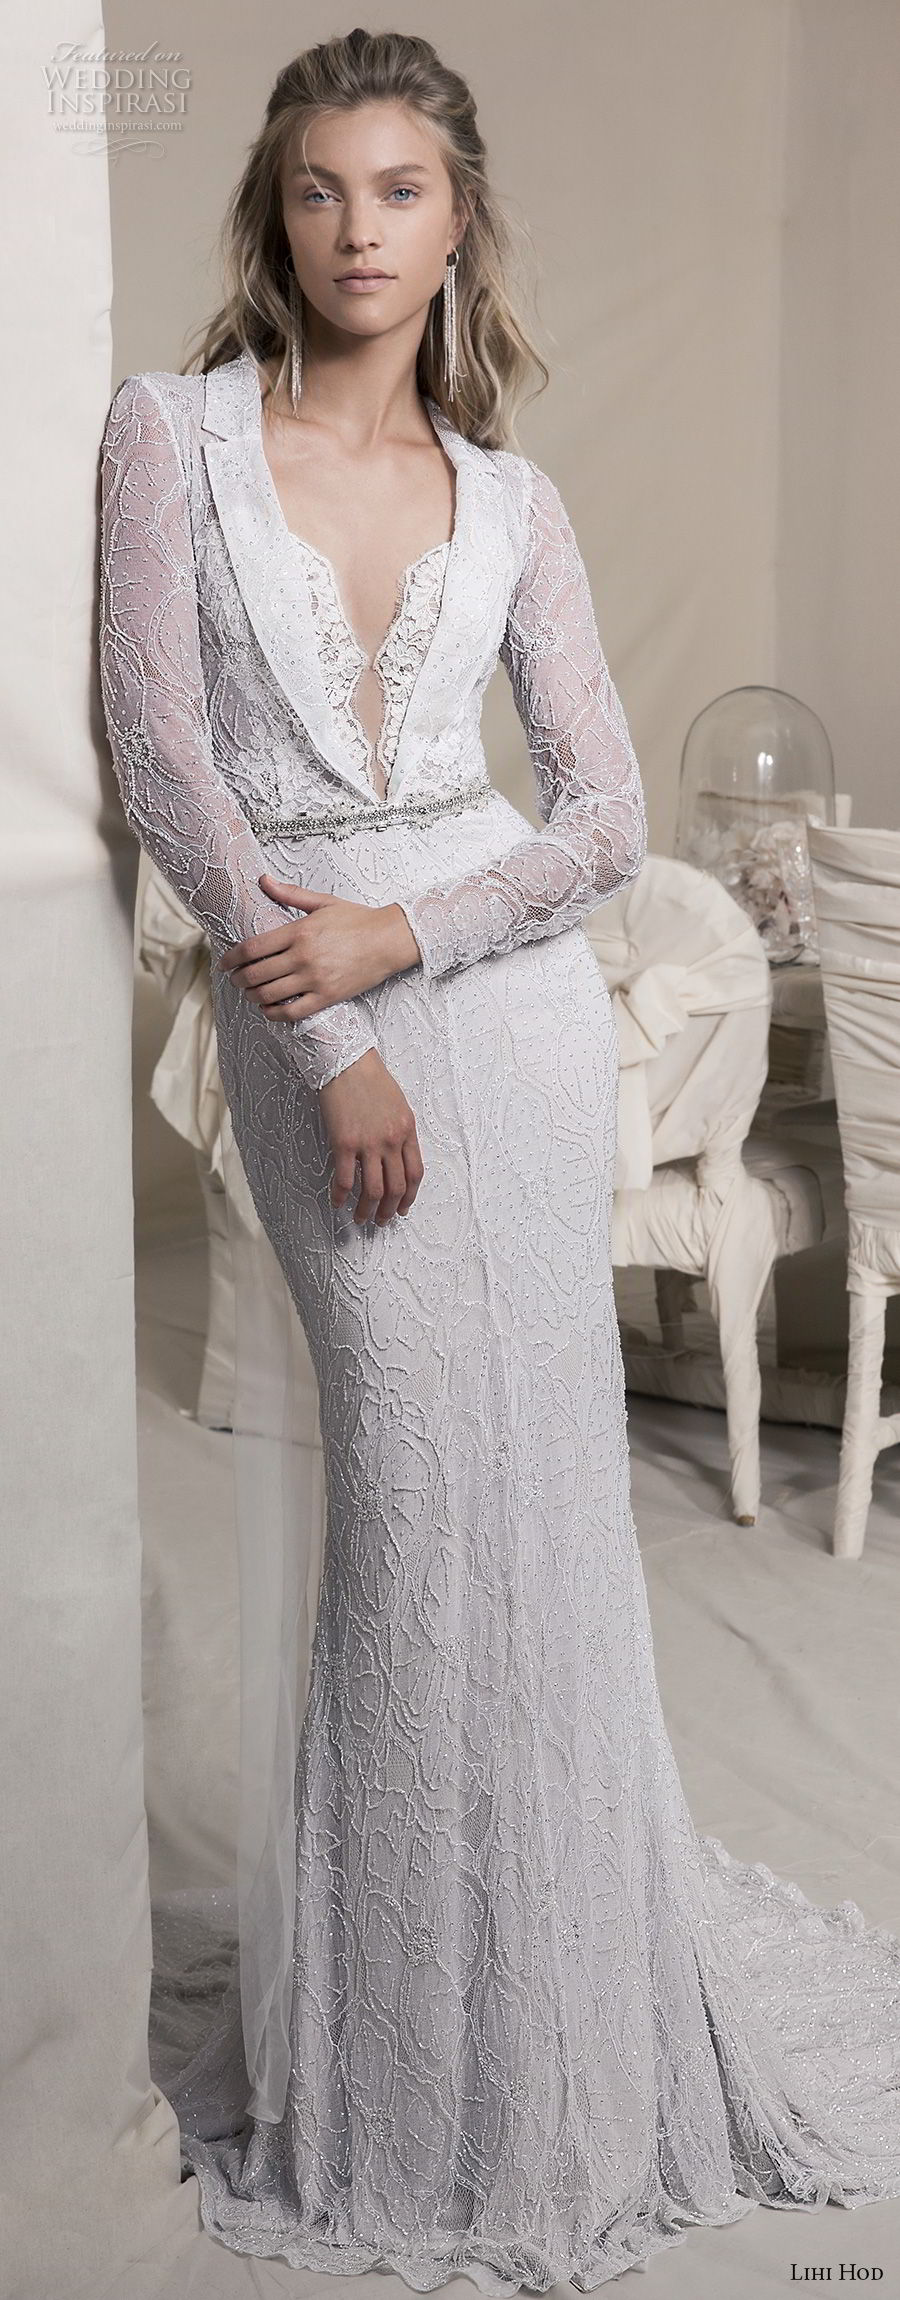 lihi hod 2018 bridal long sleeves notched collar deep v neck full embellishment elegant fit and flare sheath wedding dress covered lace back sweep train (12) mv fv